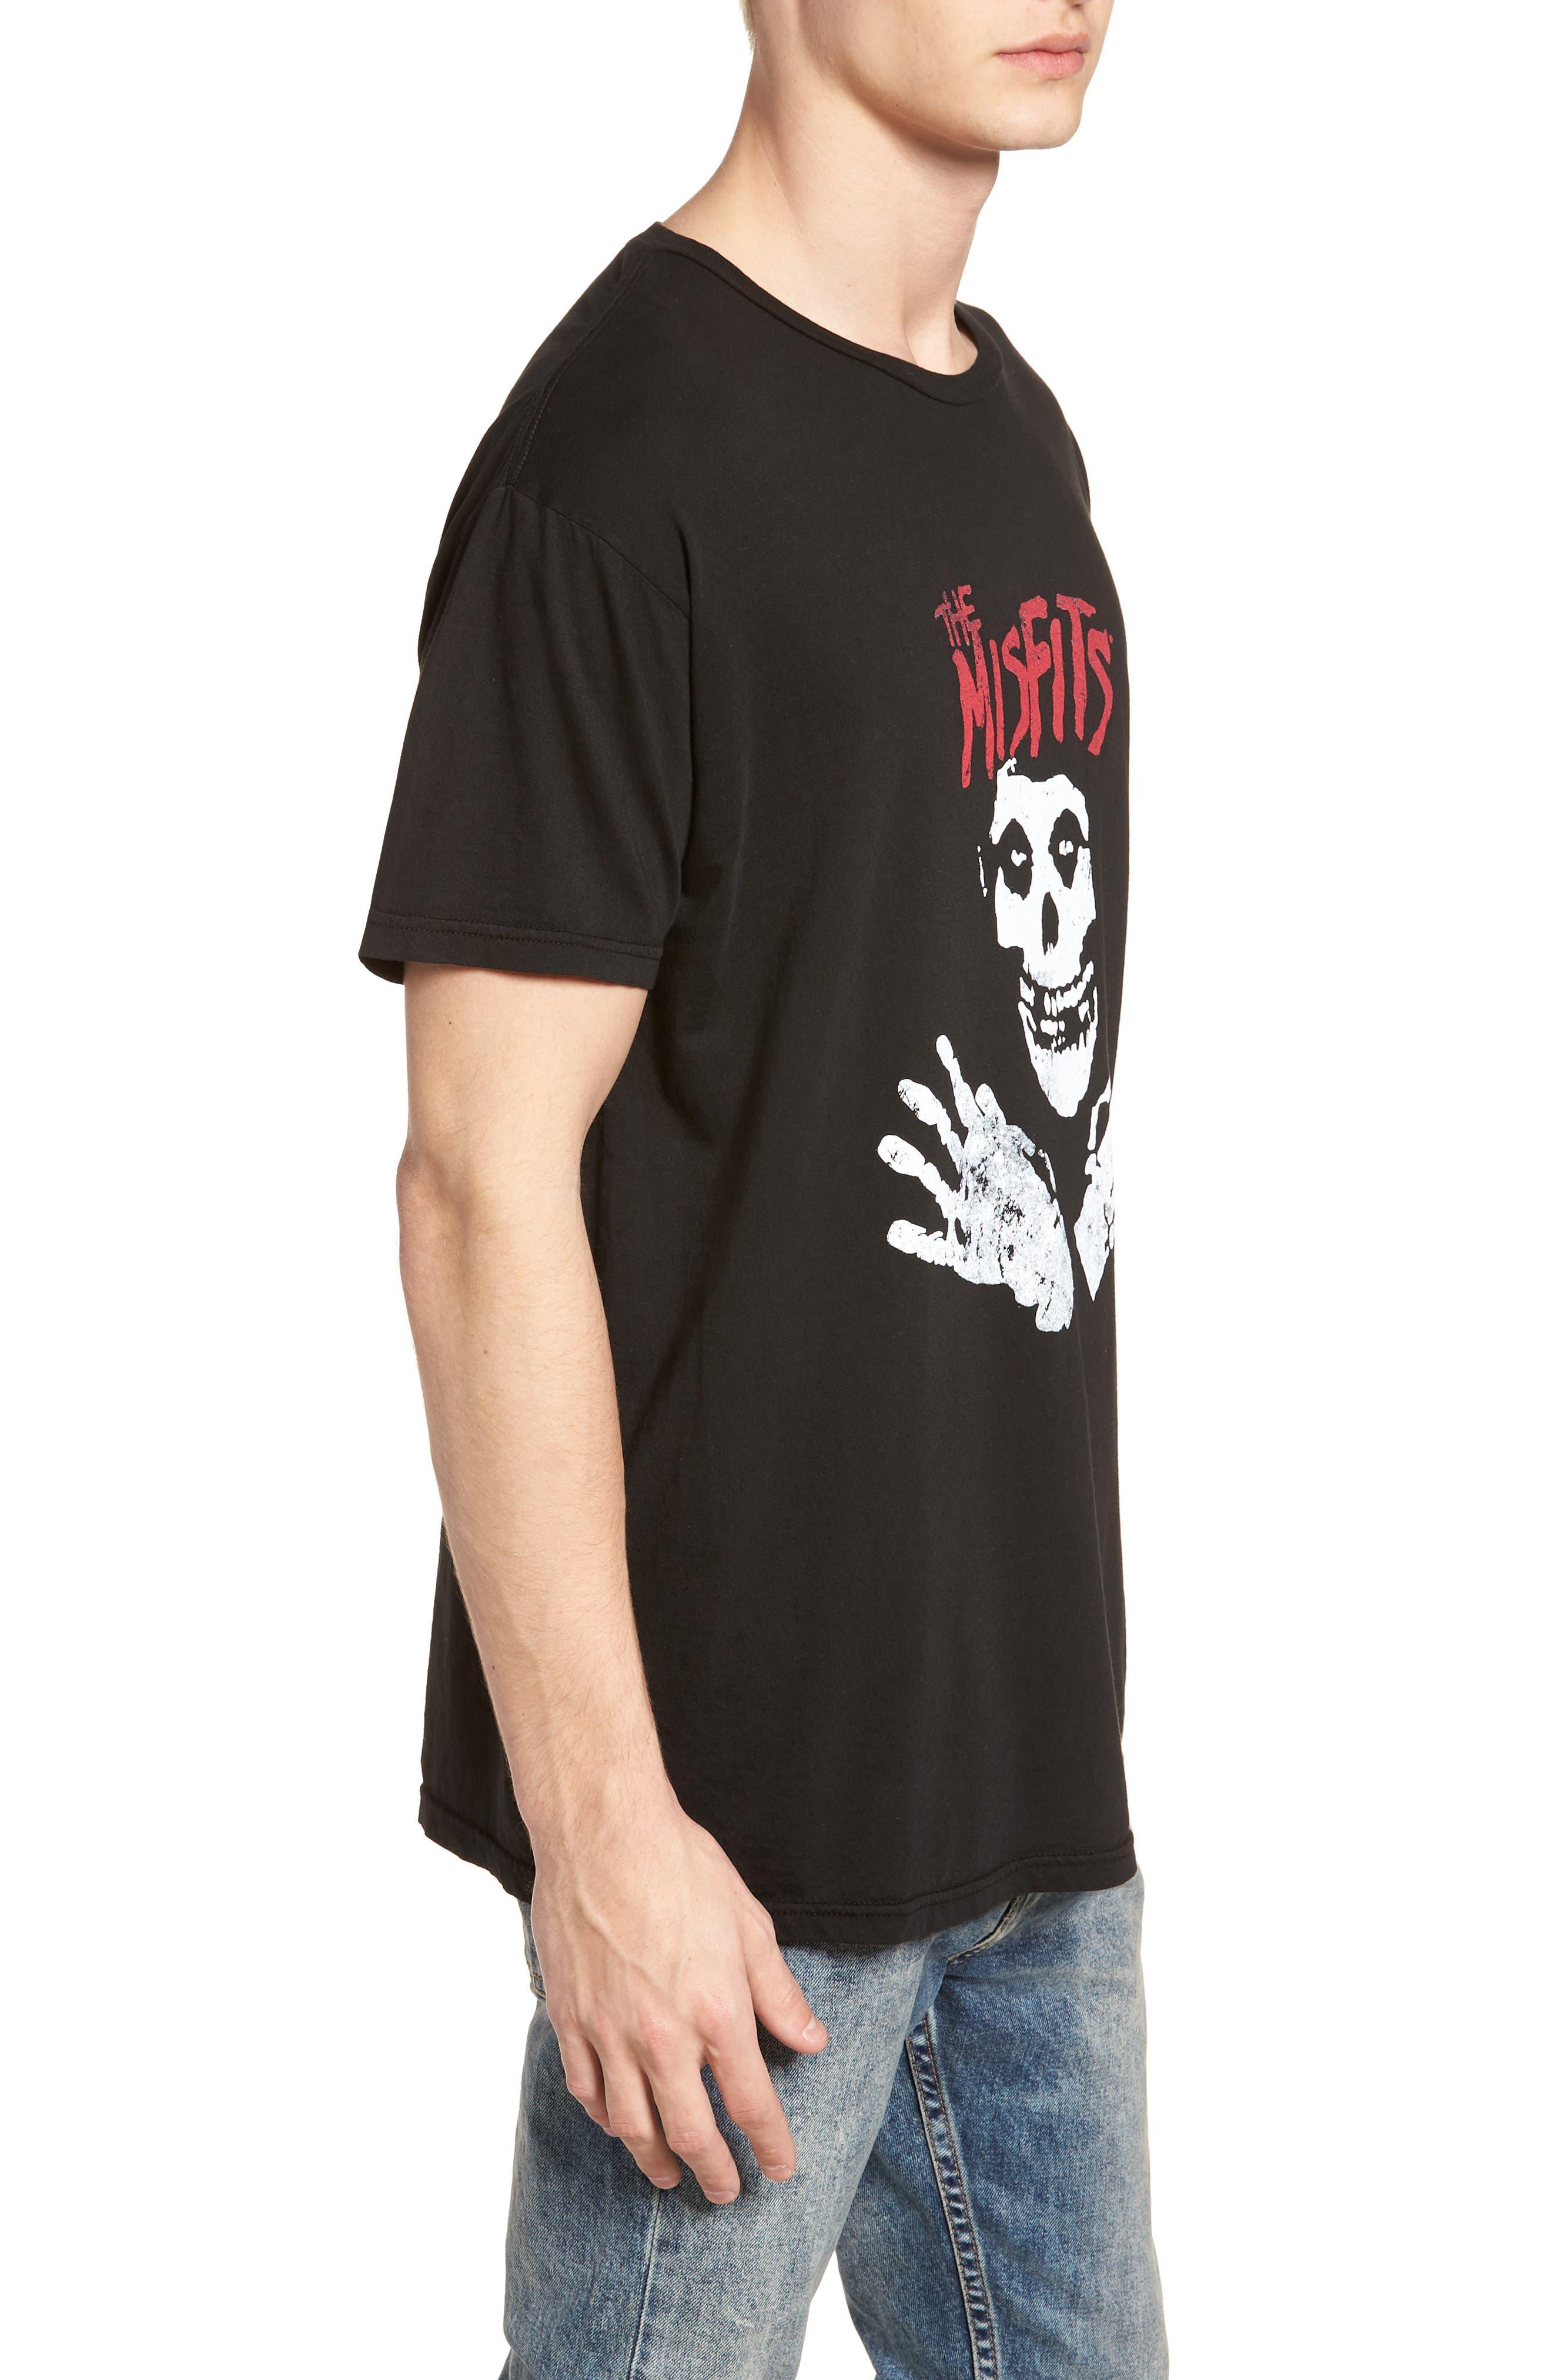 Misfits Graphic T-Shirt,                             Alternate thumbnail 3, color,                             005